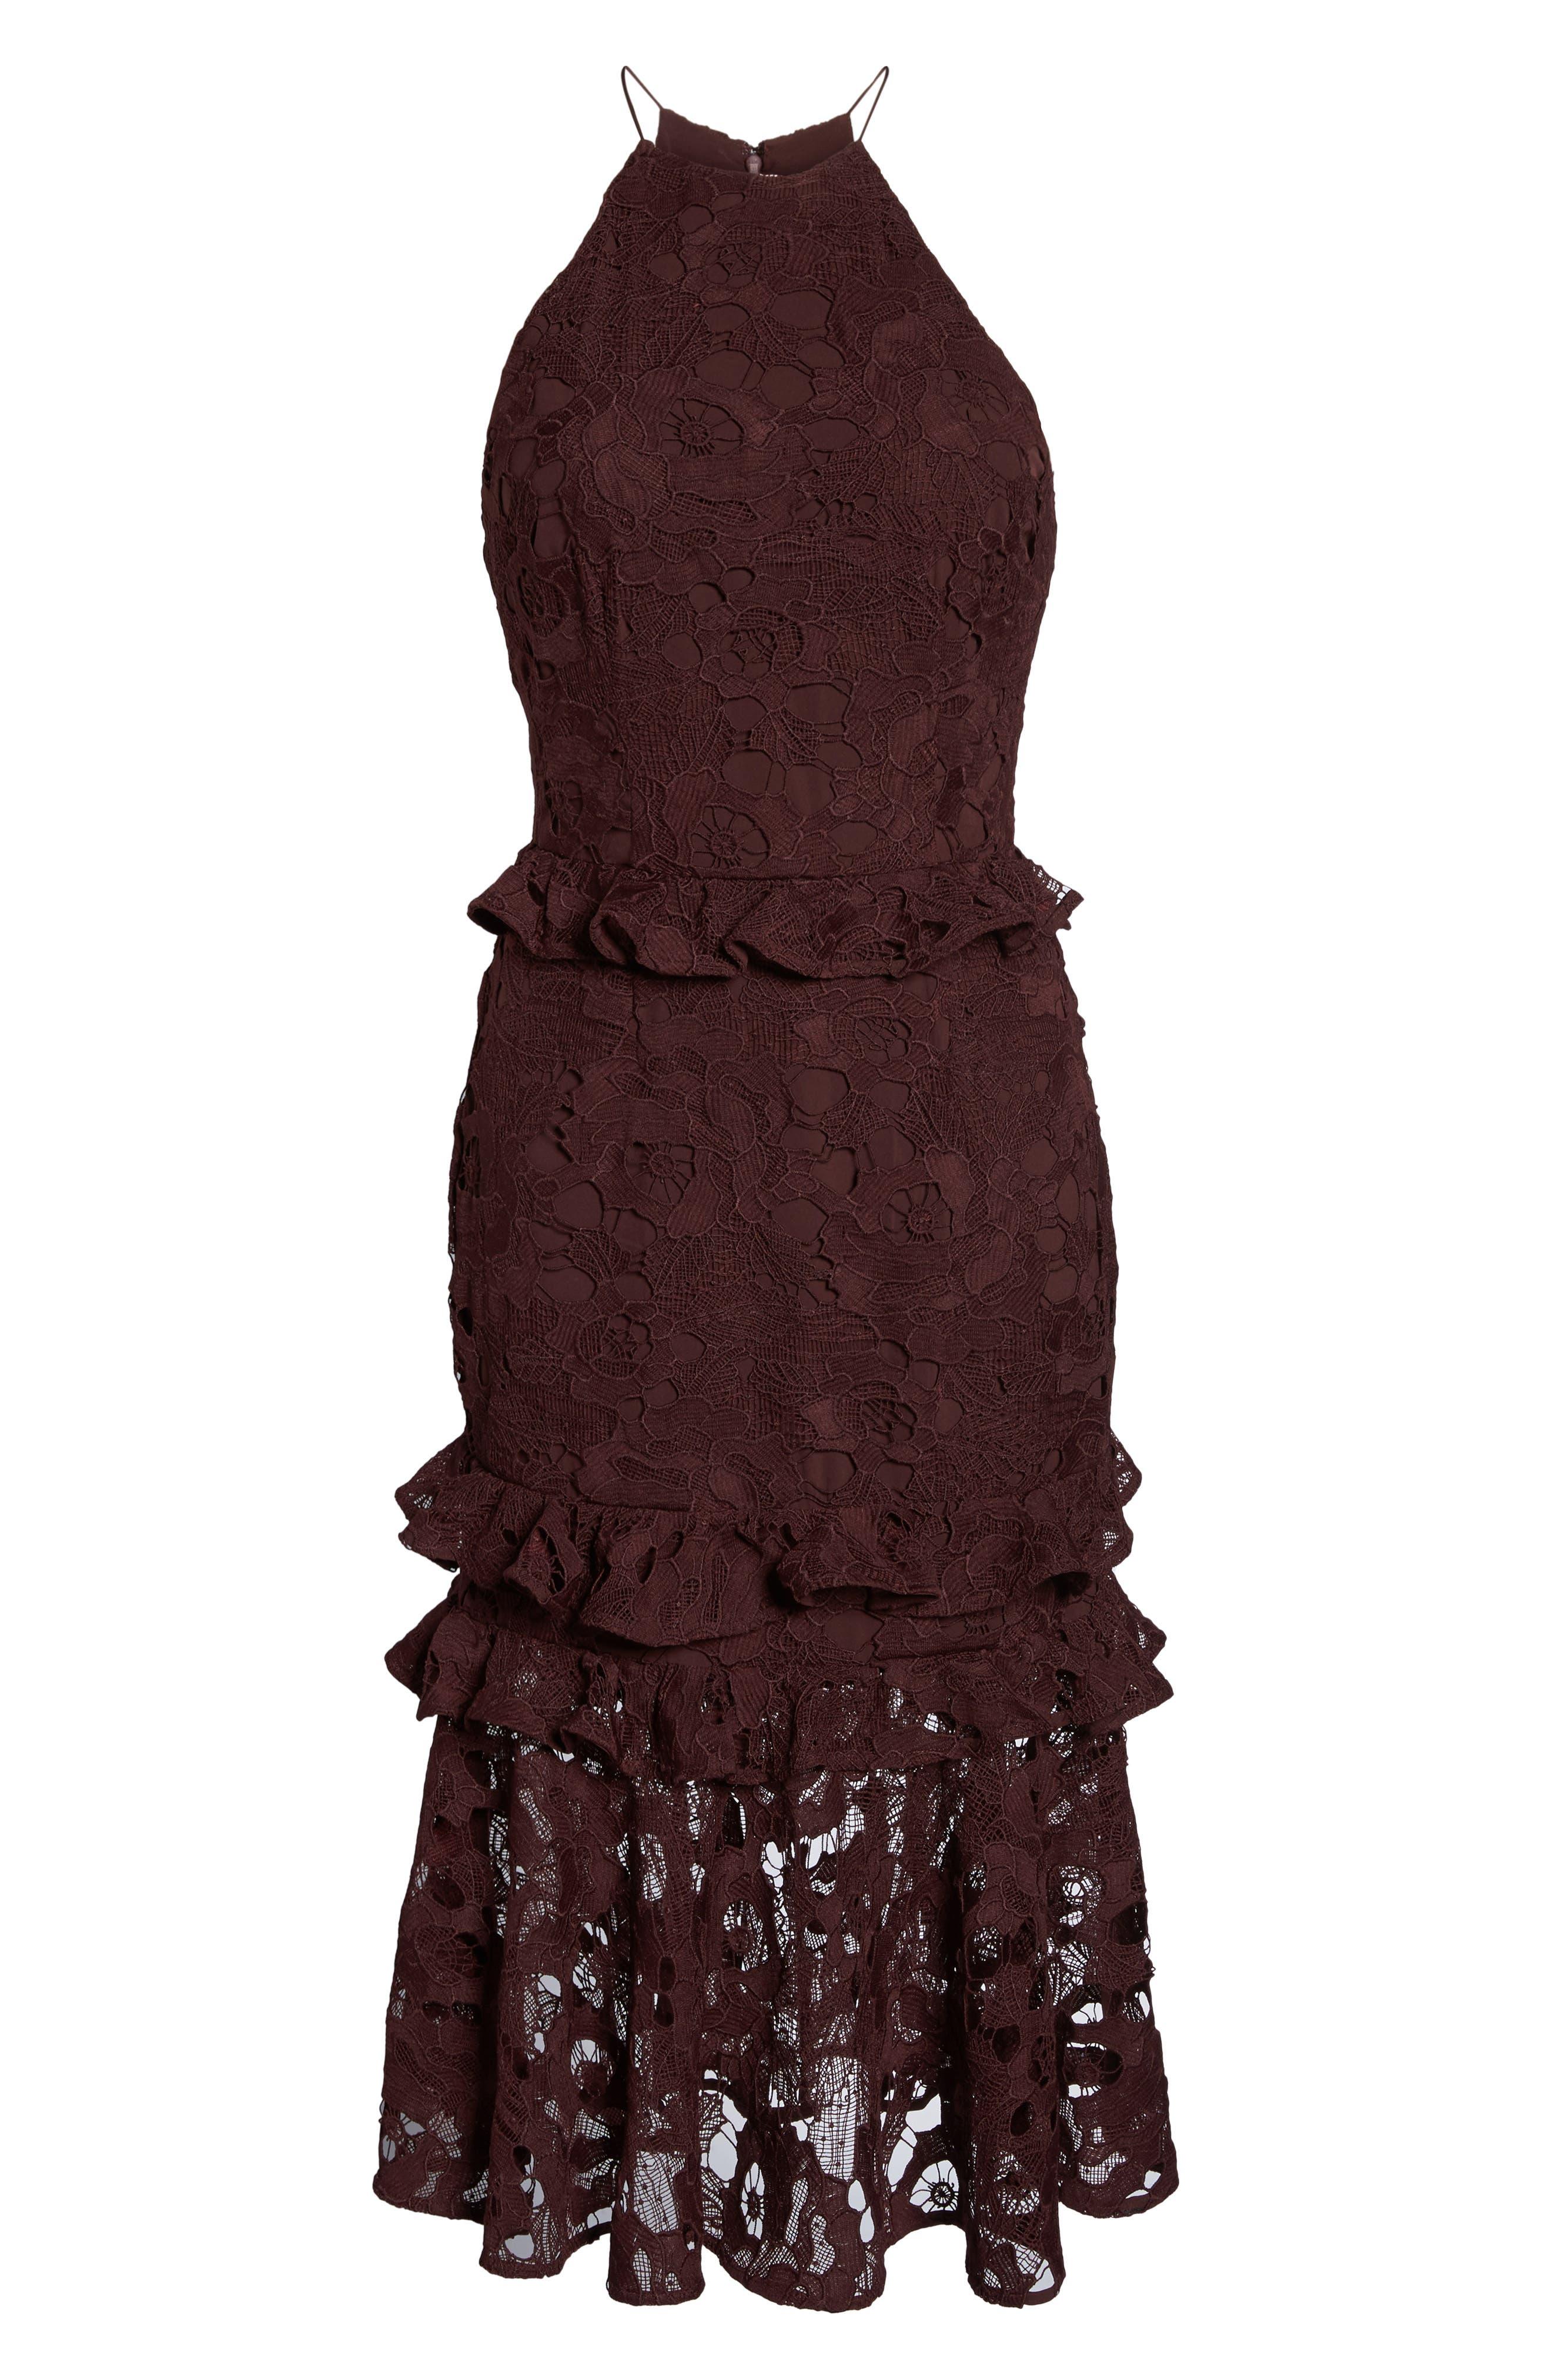 Enchantment Lace Midi Dress,                             Alternate thumbnail 6, color,                             930